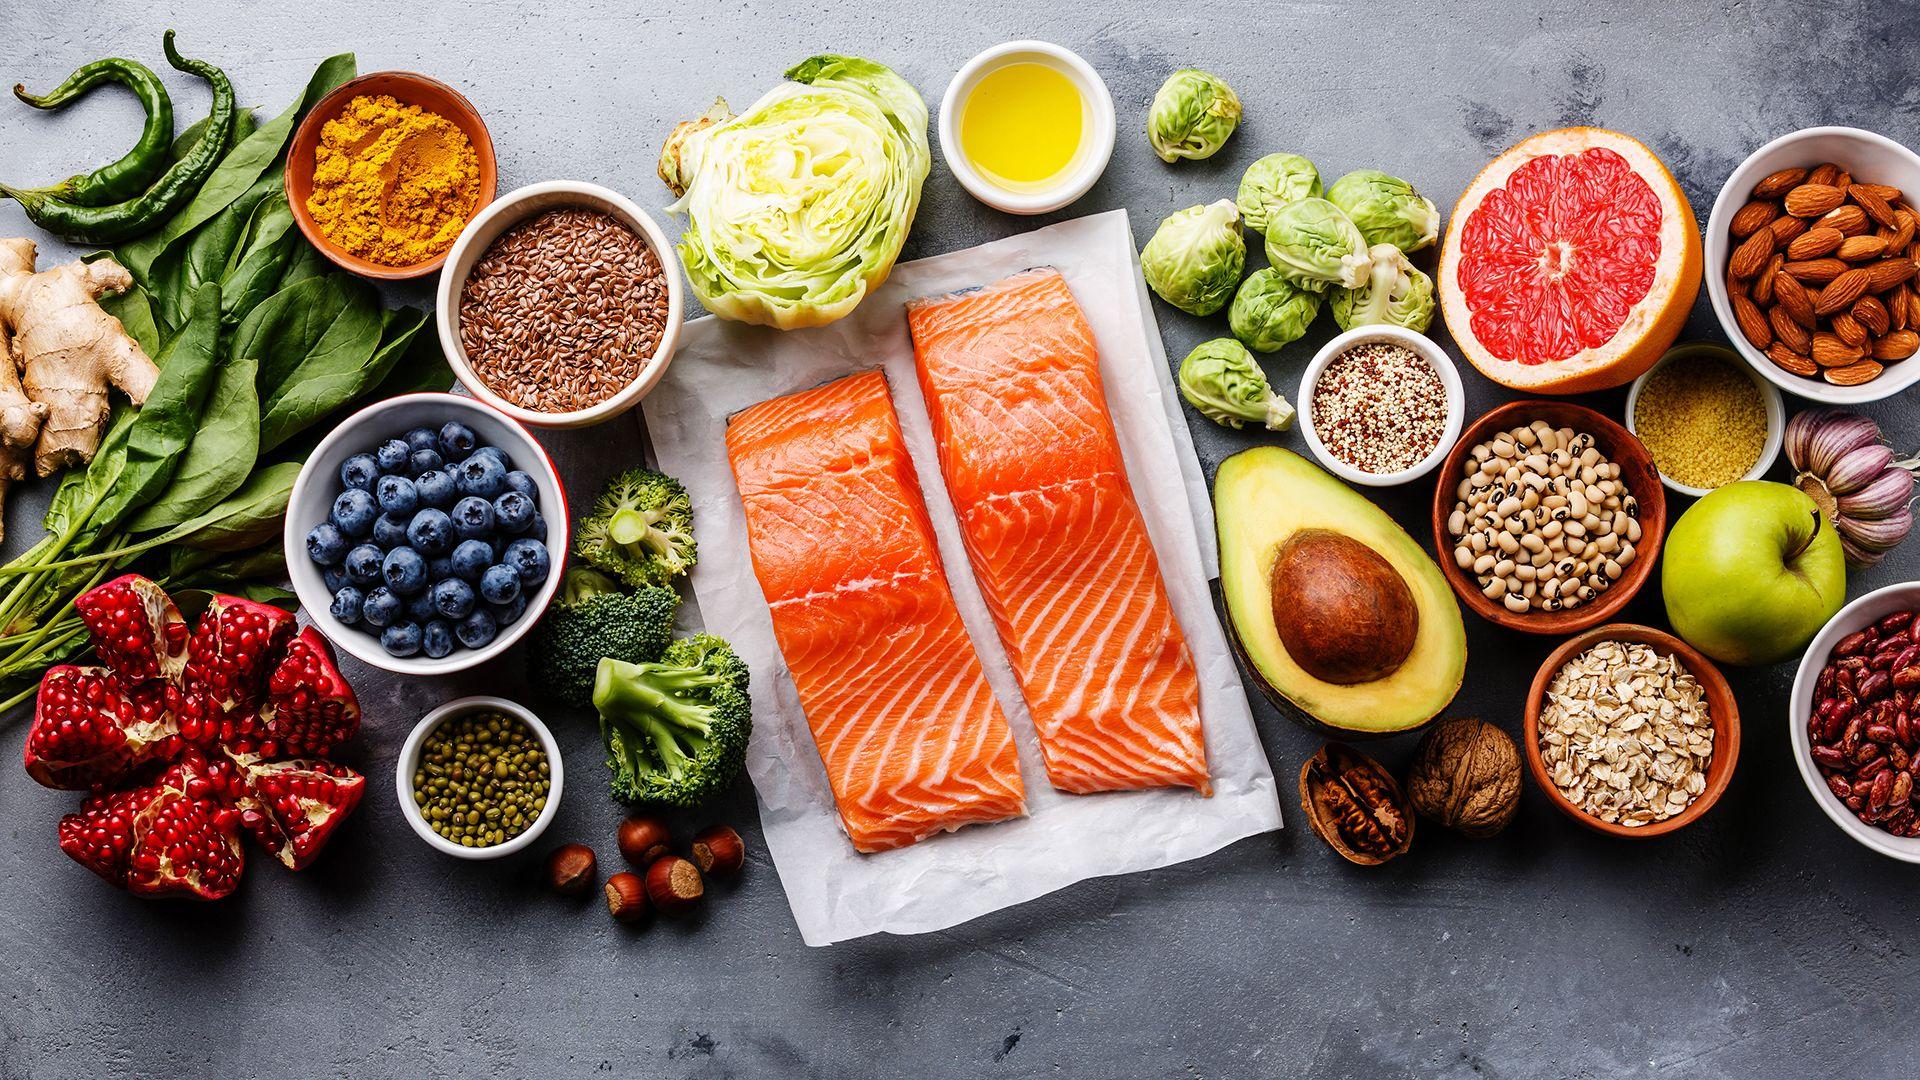 5 Anti-Inflammatory Foods for Knee Osteoarthritis